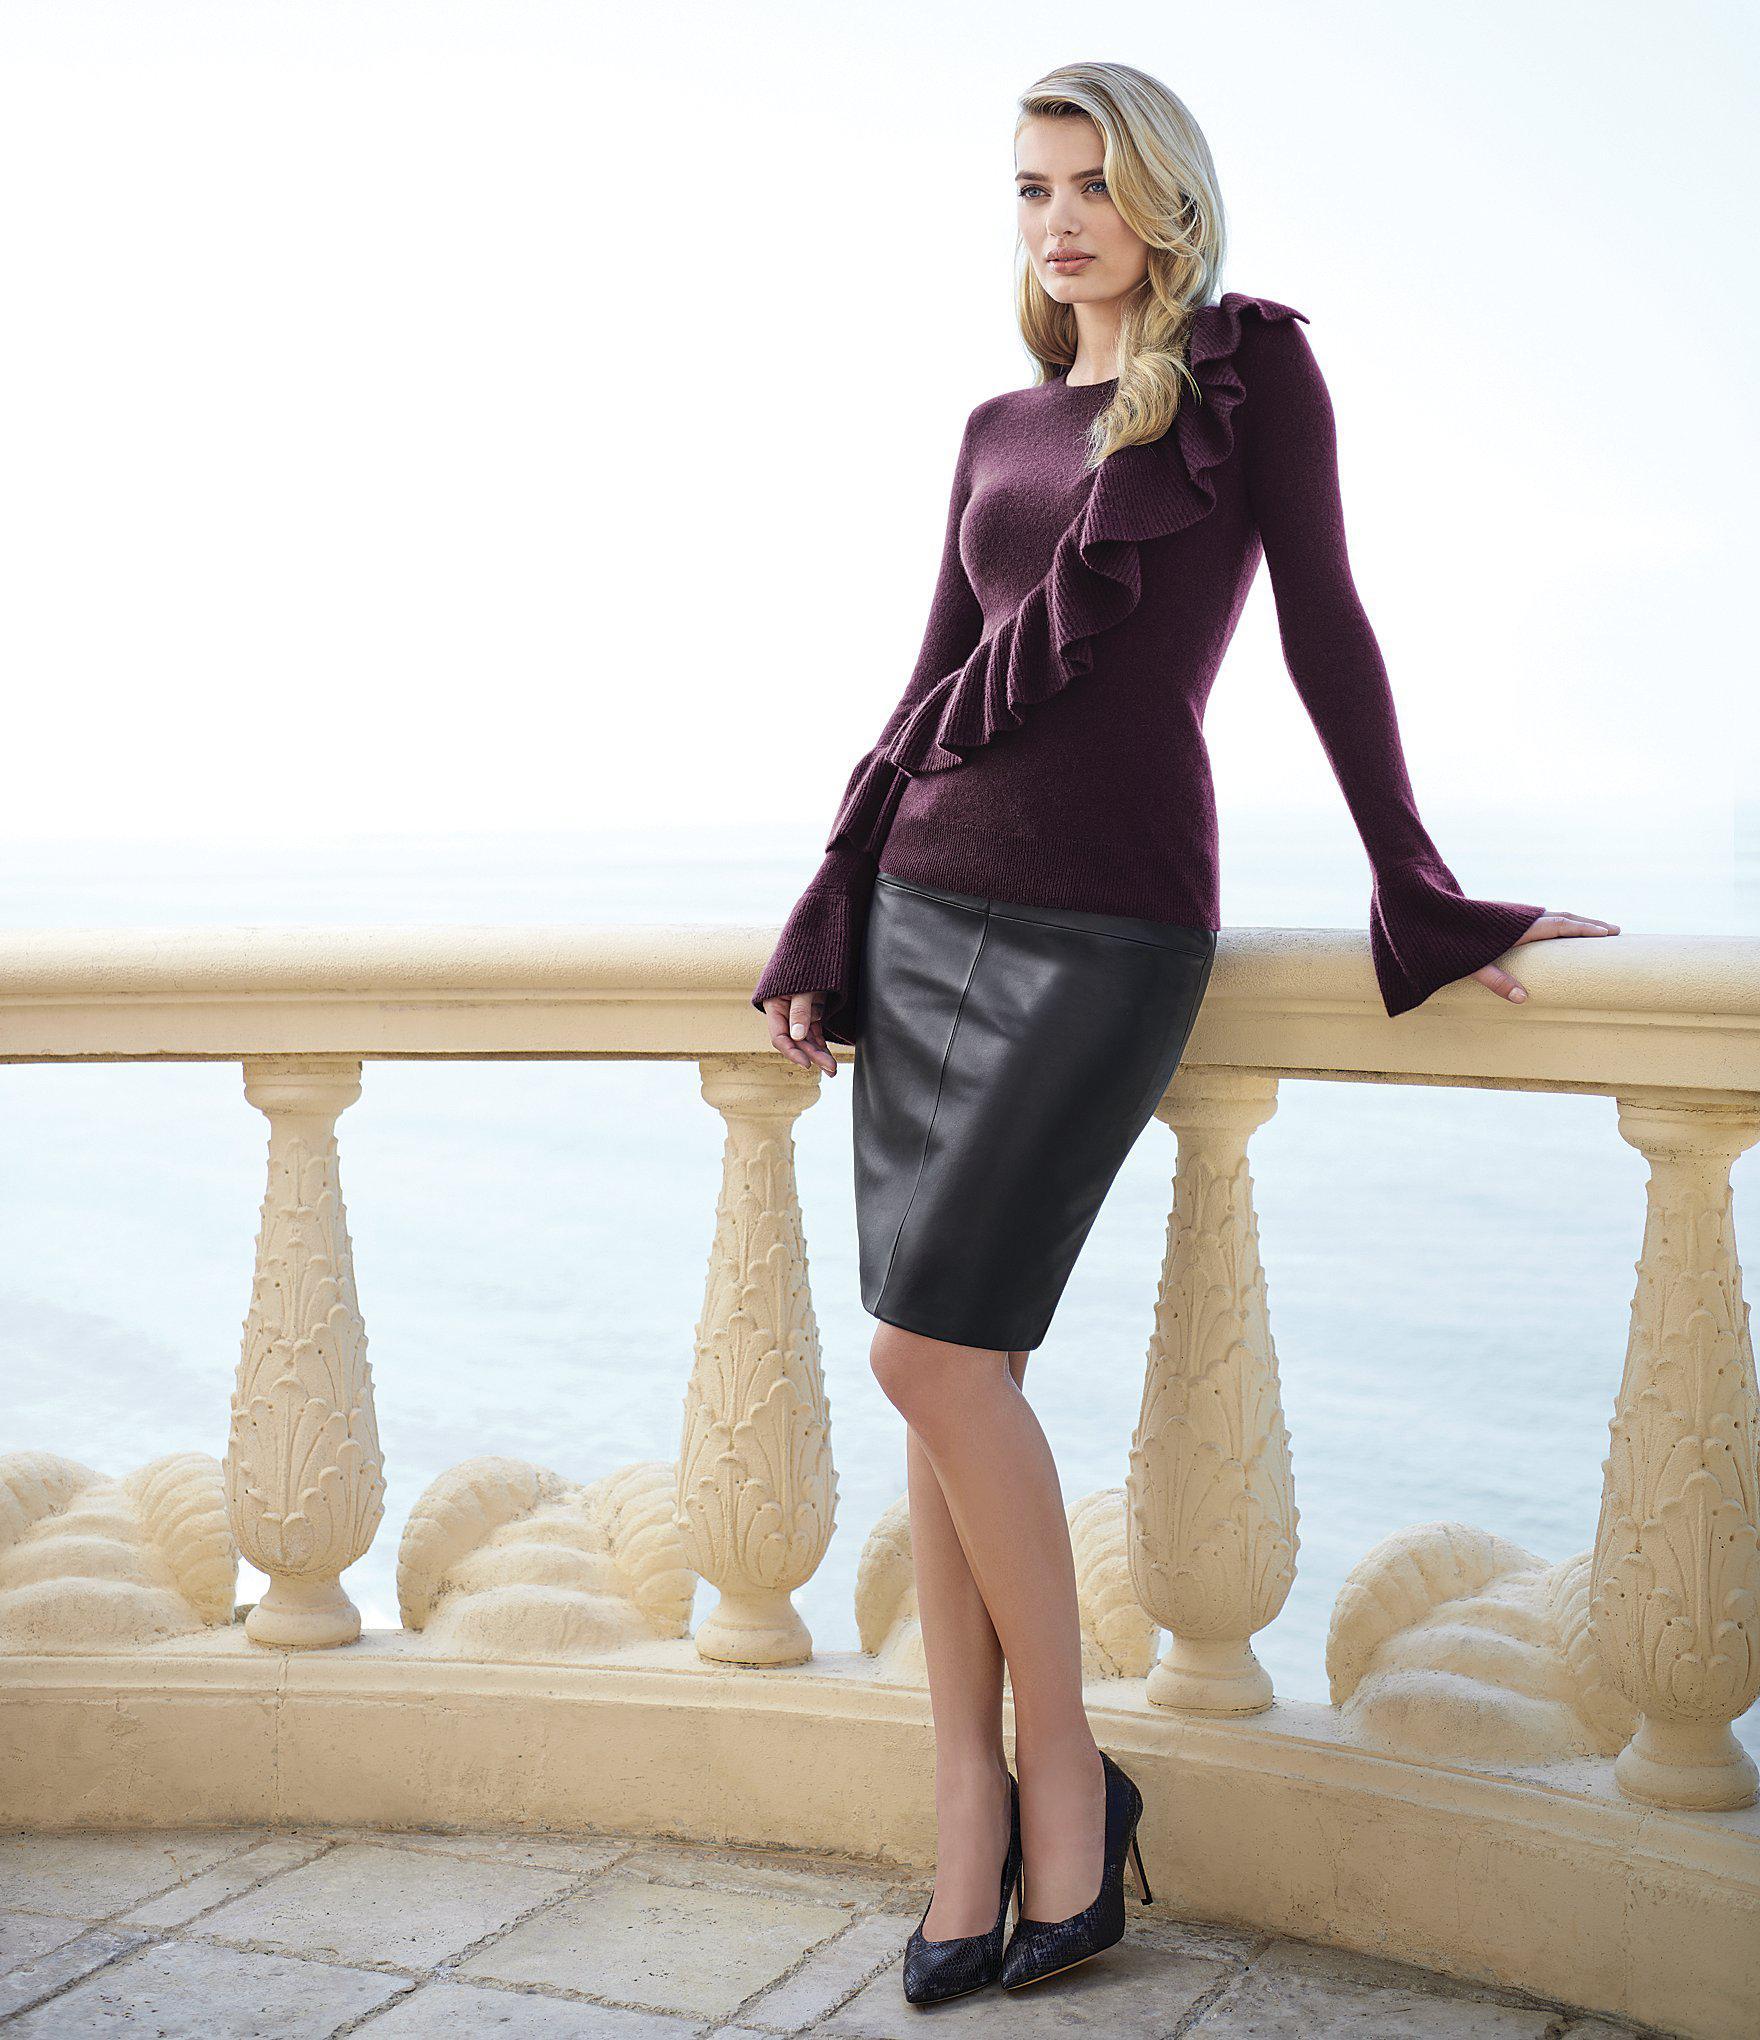 b526c0ea97d Lyst - Antonio Melani Luxury Collection Adrienne Cashmere Ruffle ...